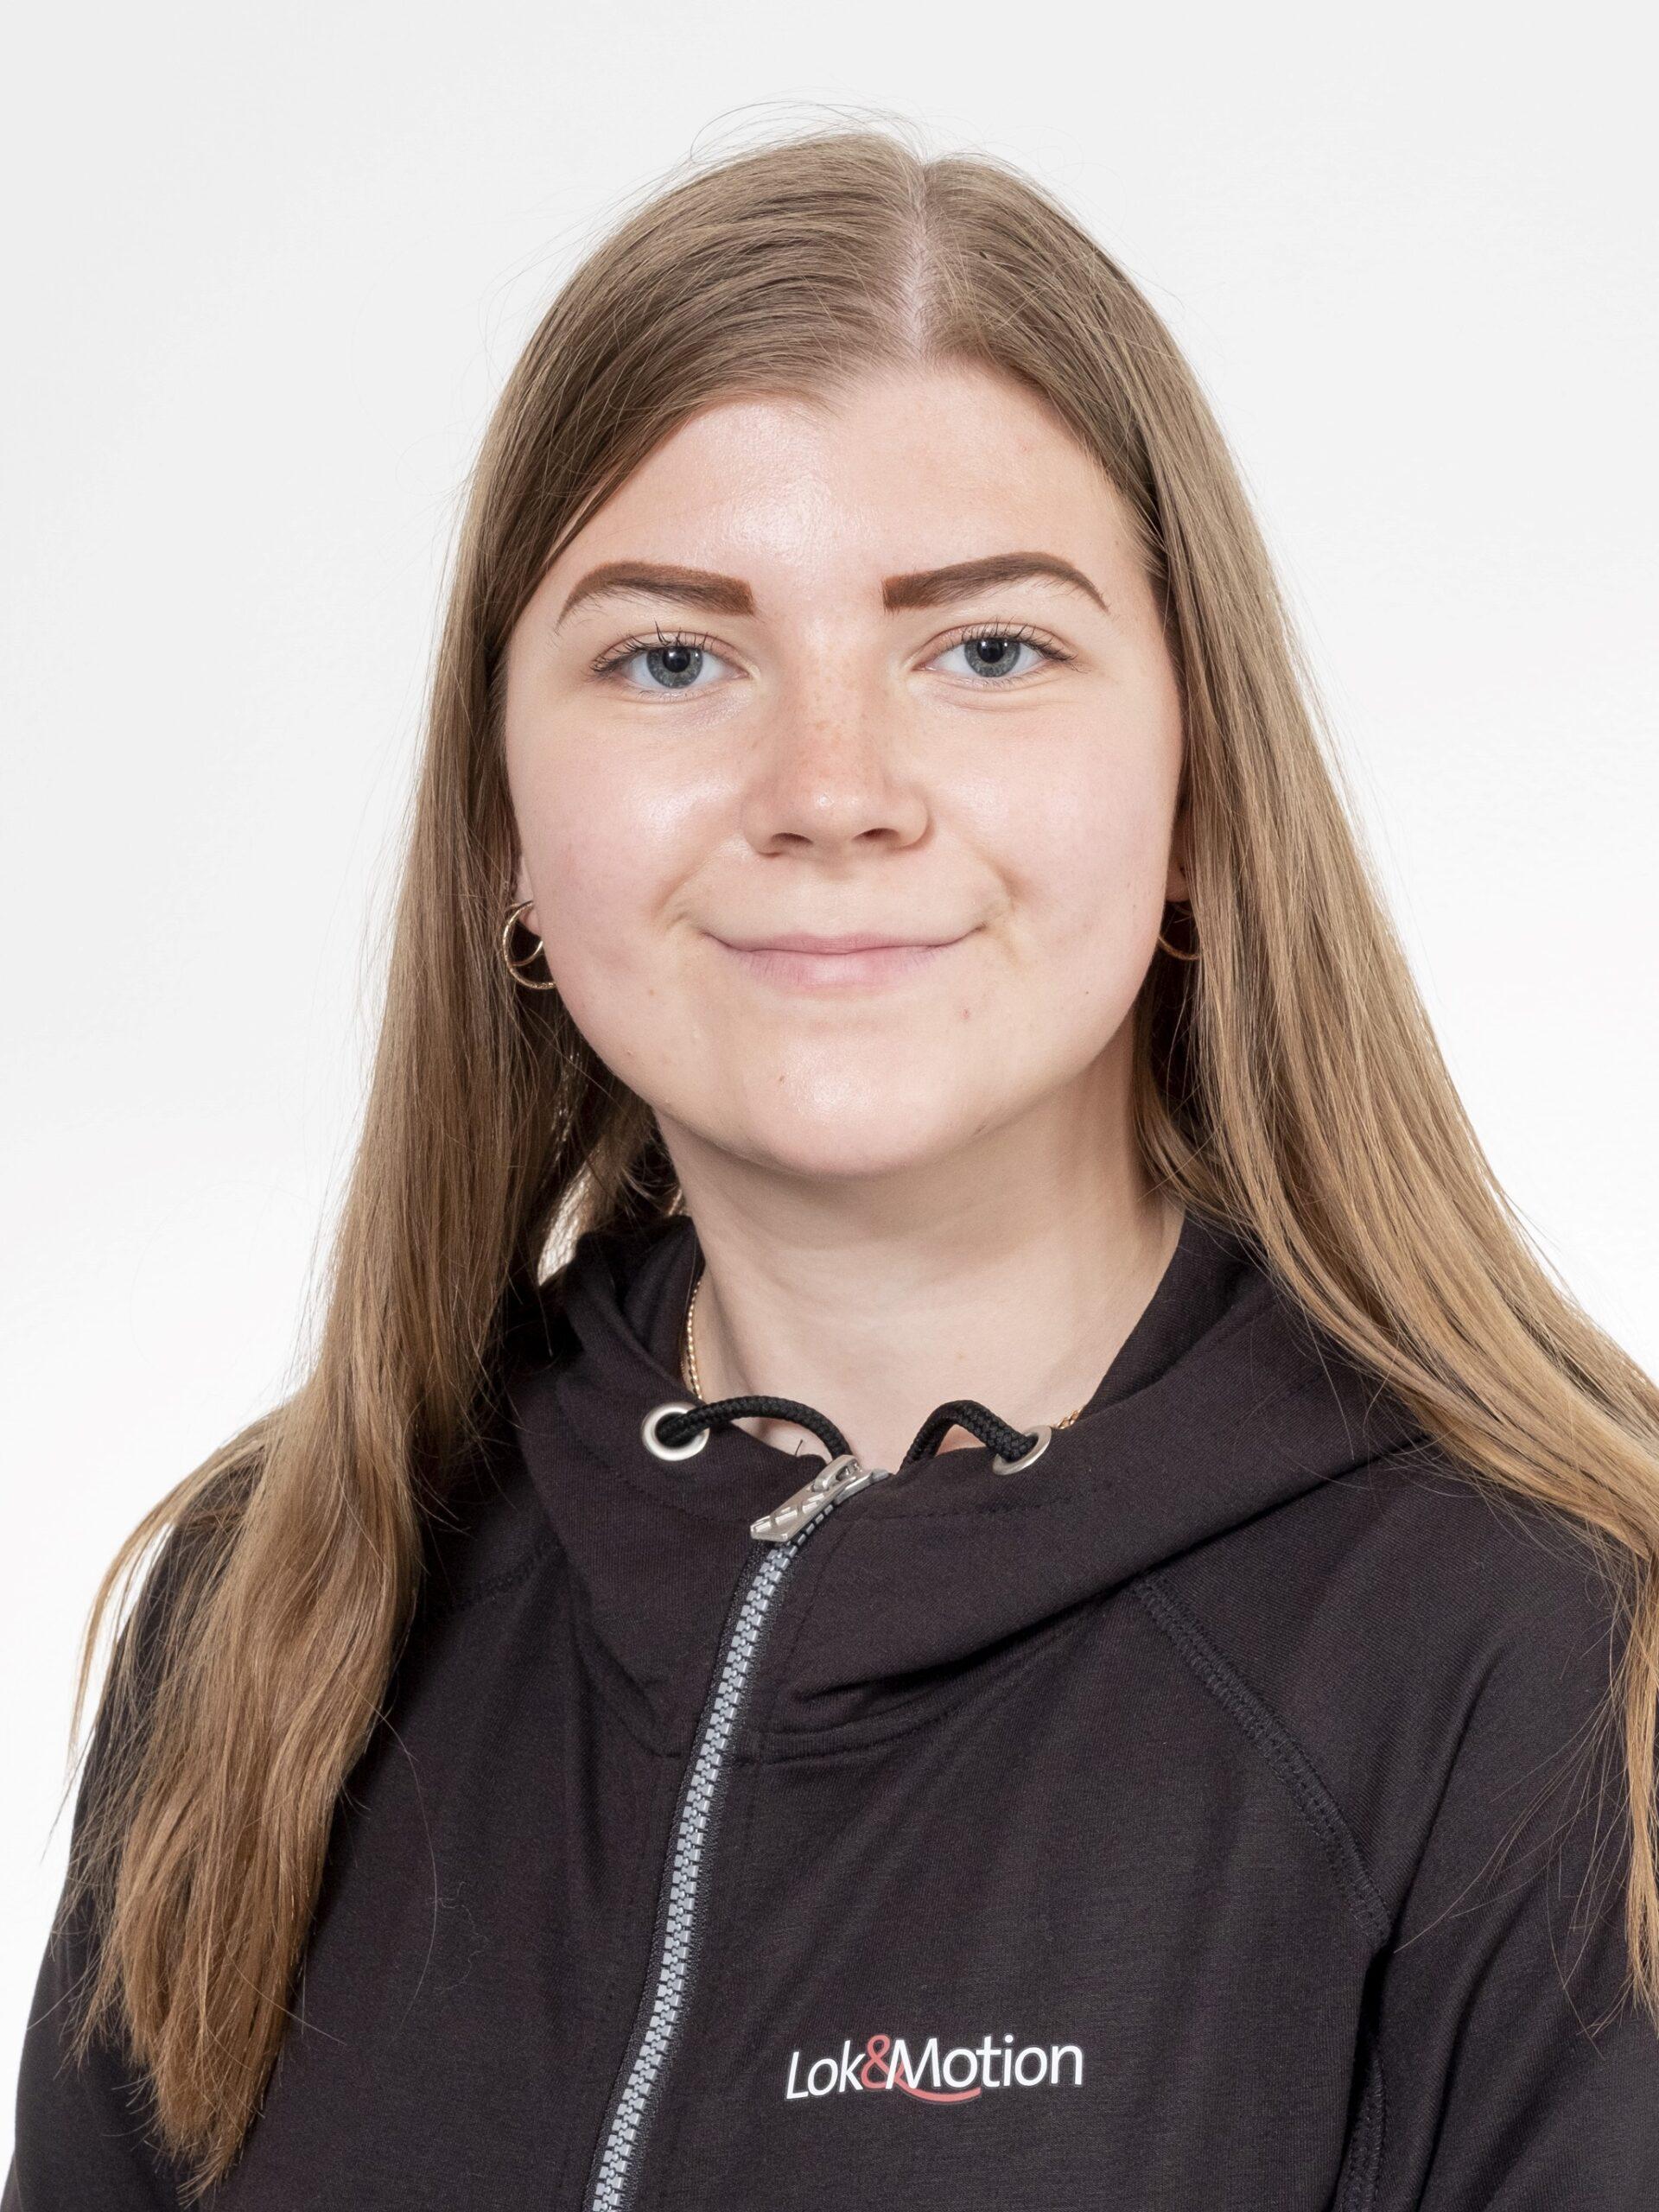 Felicia Gralvik